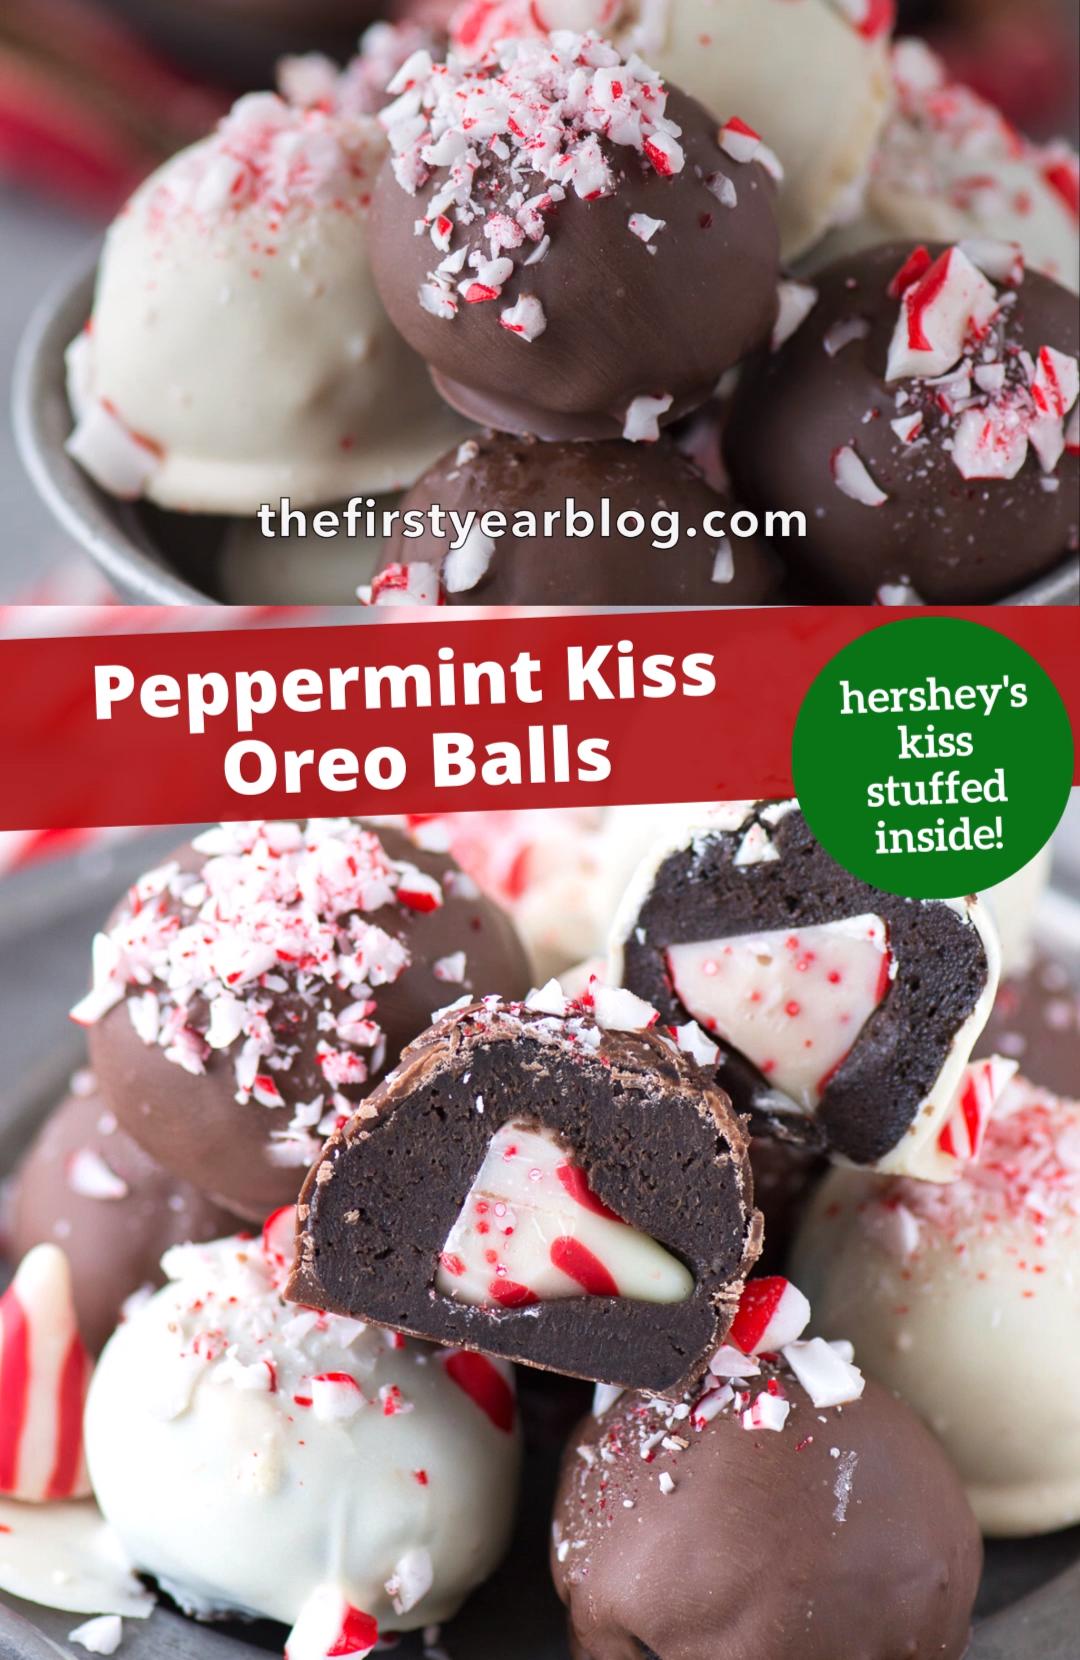 Peppermint Kiss Oreo Balls